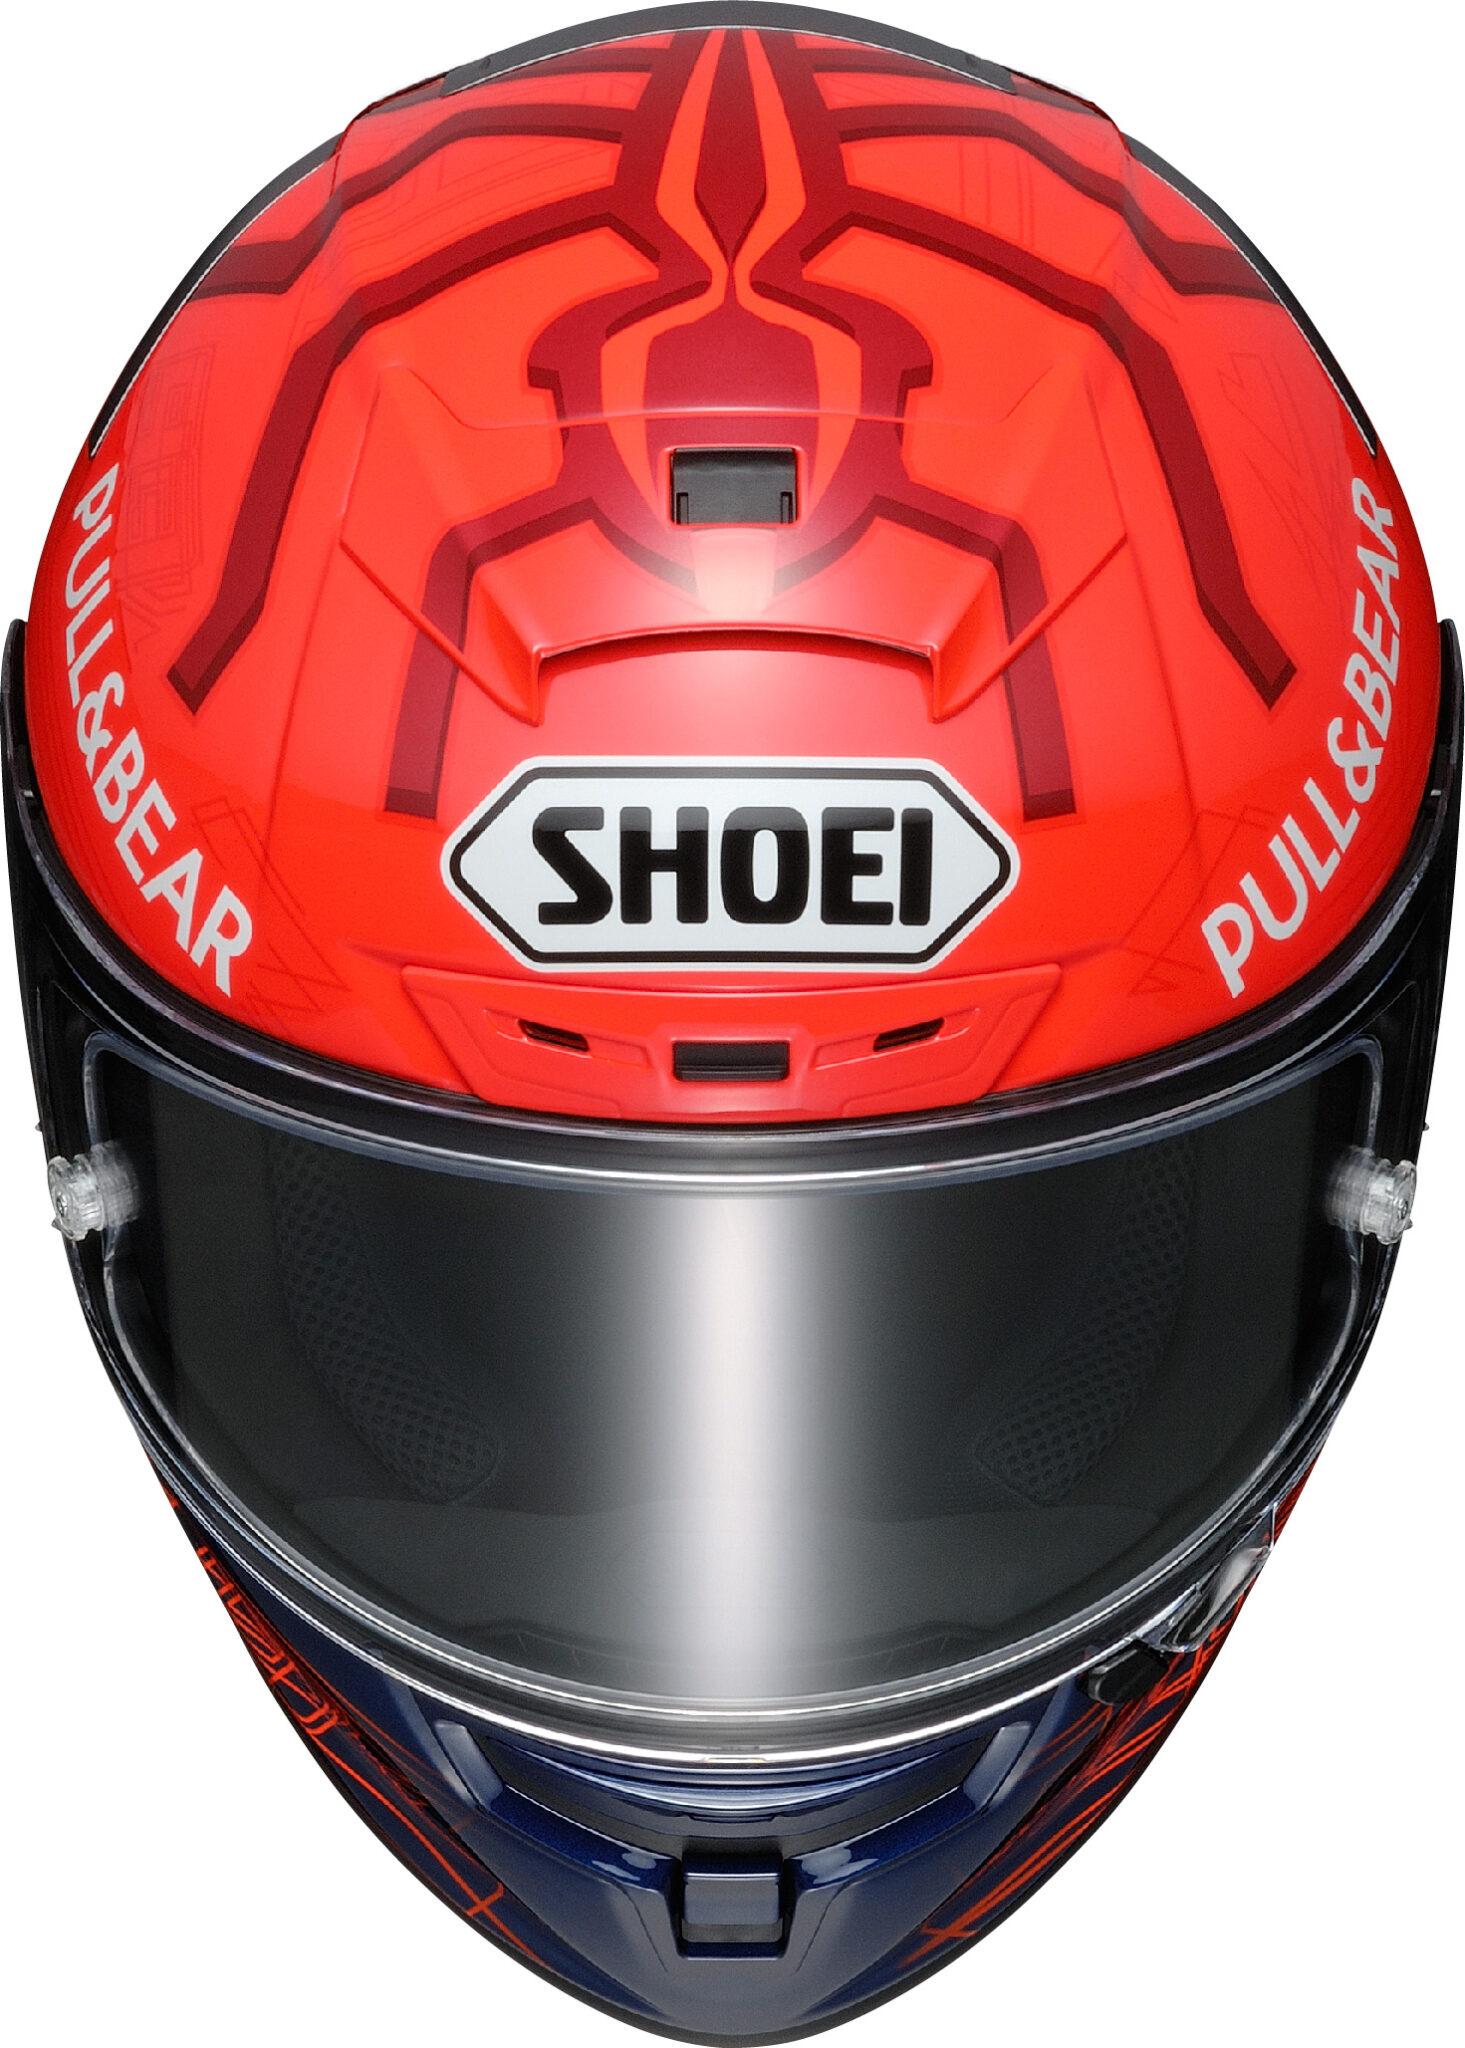 Nieuwe Shoei Marquez replica's